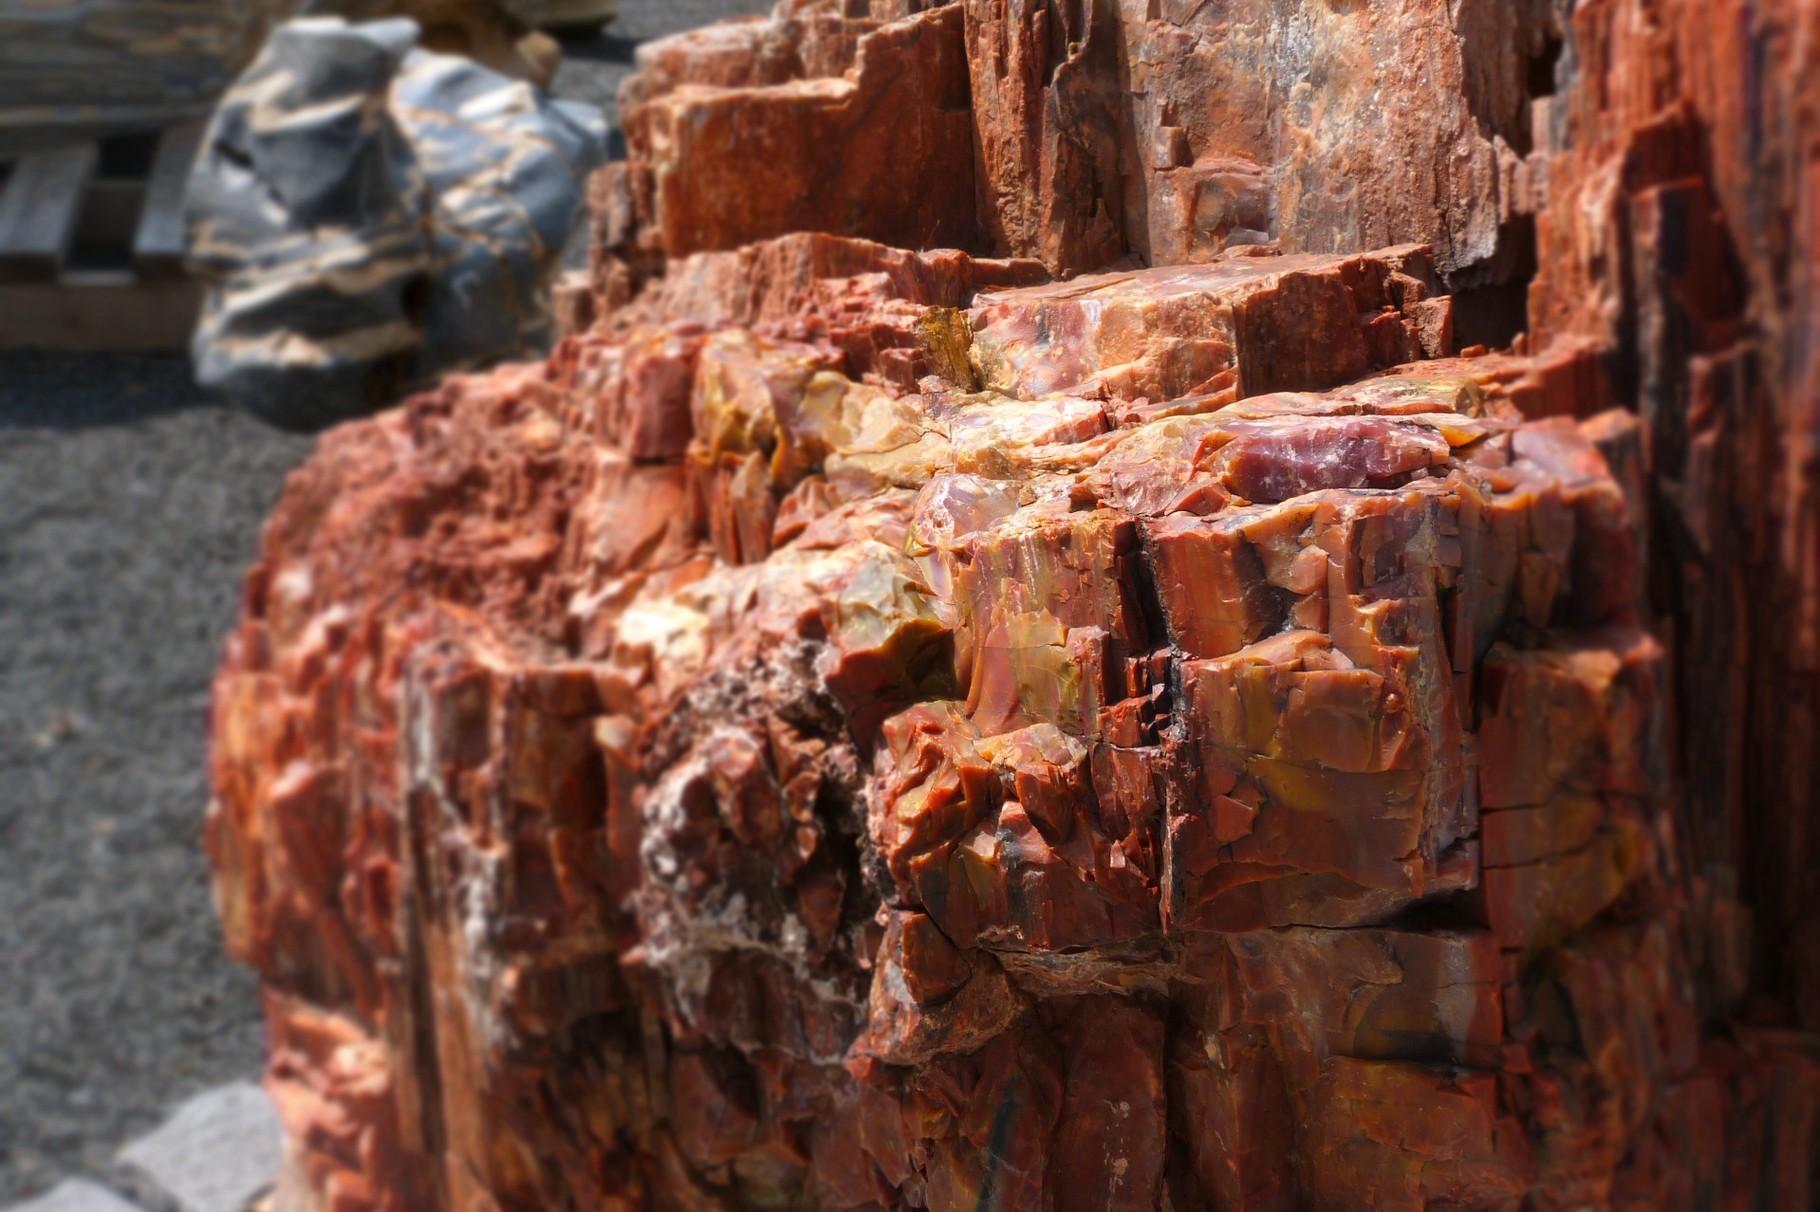 Versteinertes Holz/Petrified Wood -Terra Domo in Filderstadt